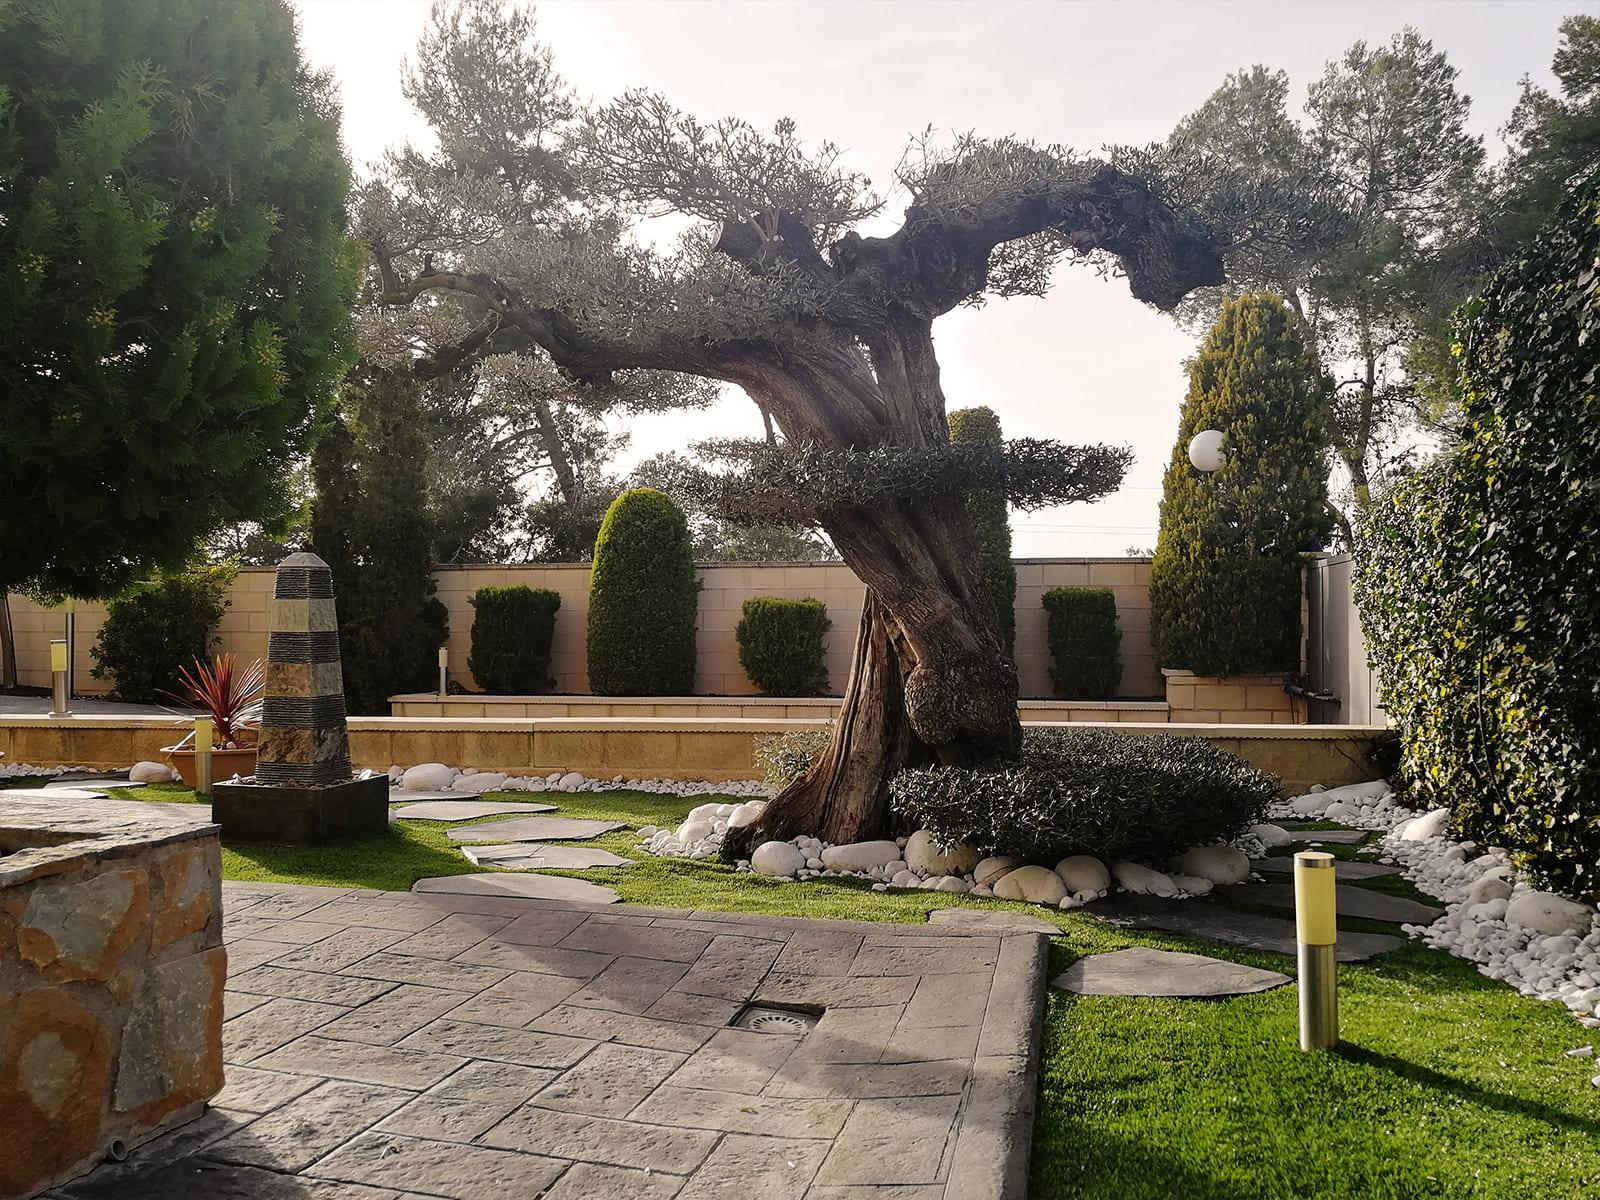 diseño-jardines-espacio-olivo-MM-04_HIDROJARDIN-Bañeres